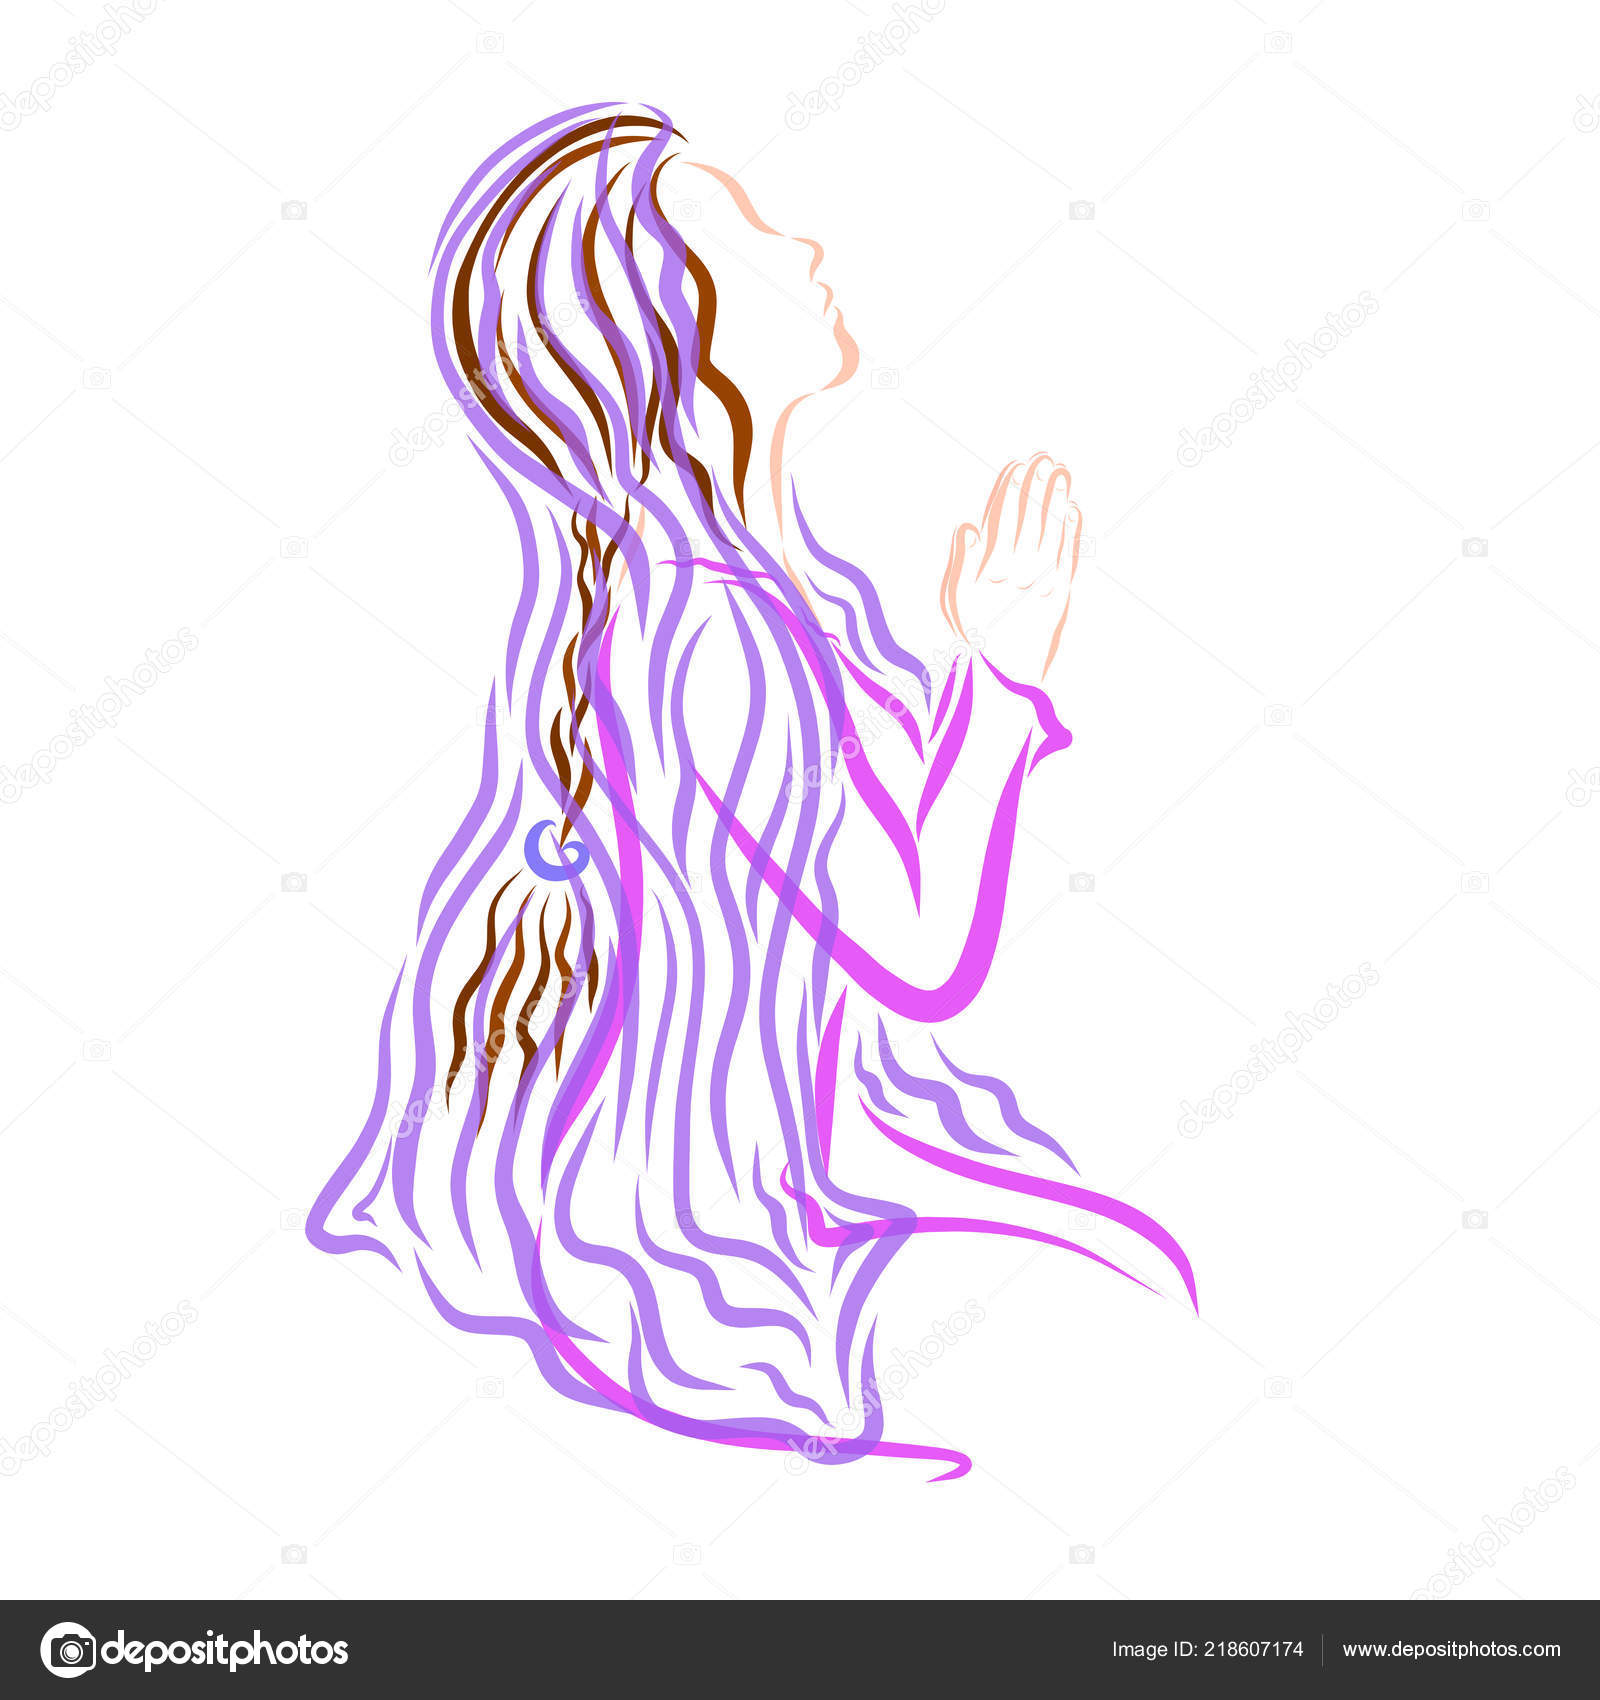 Young Praying Woman Lilac Dress Headscarf Her Head — Stock Photo